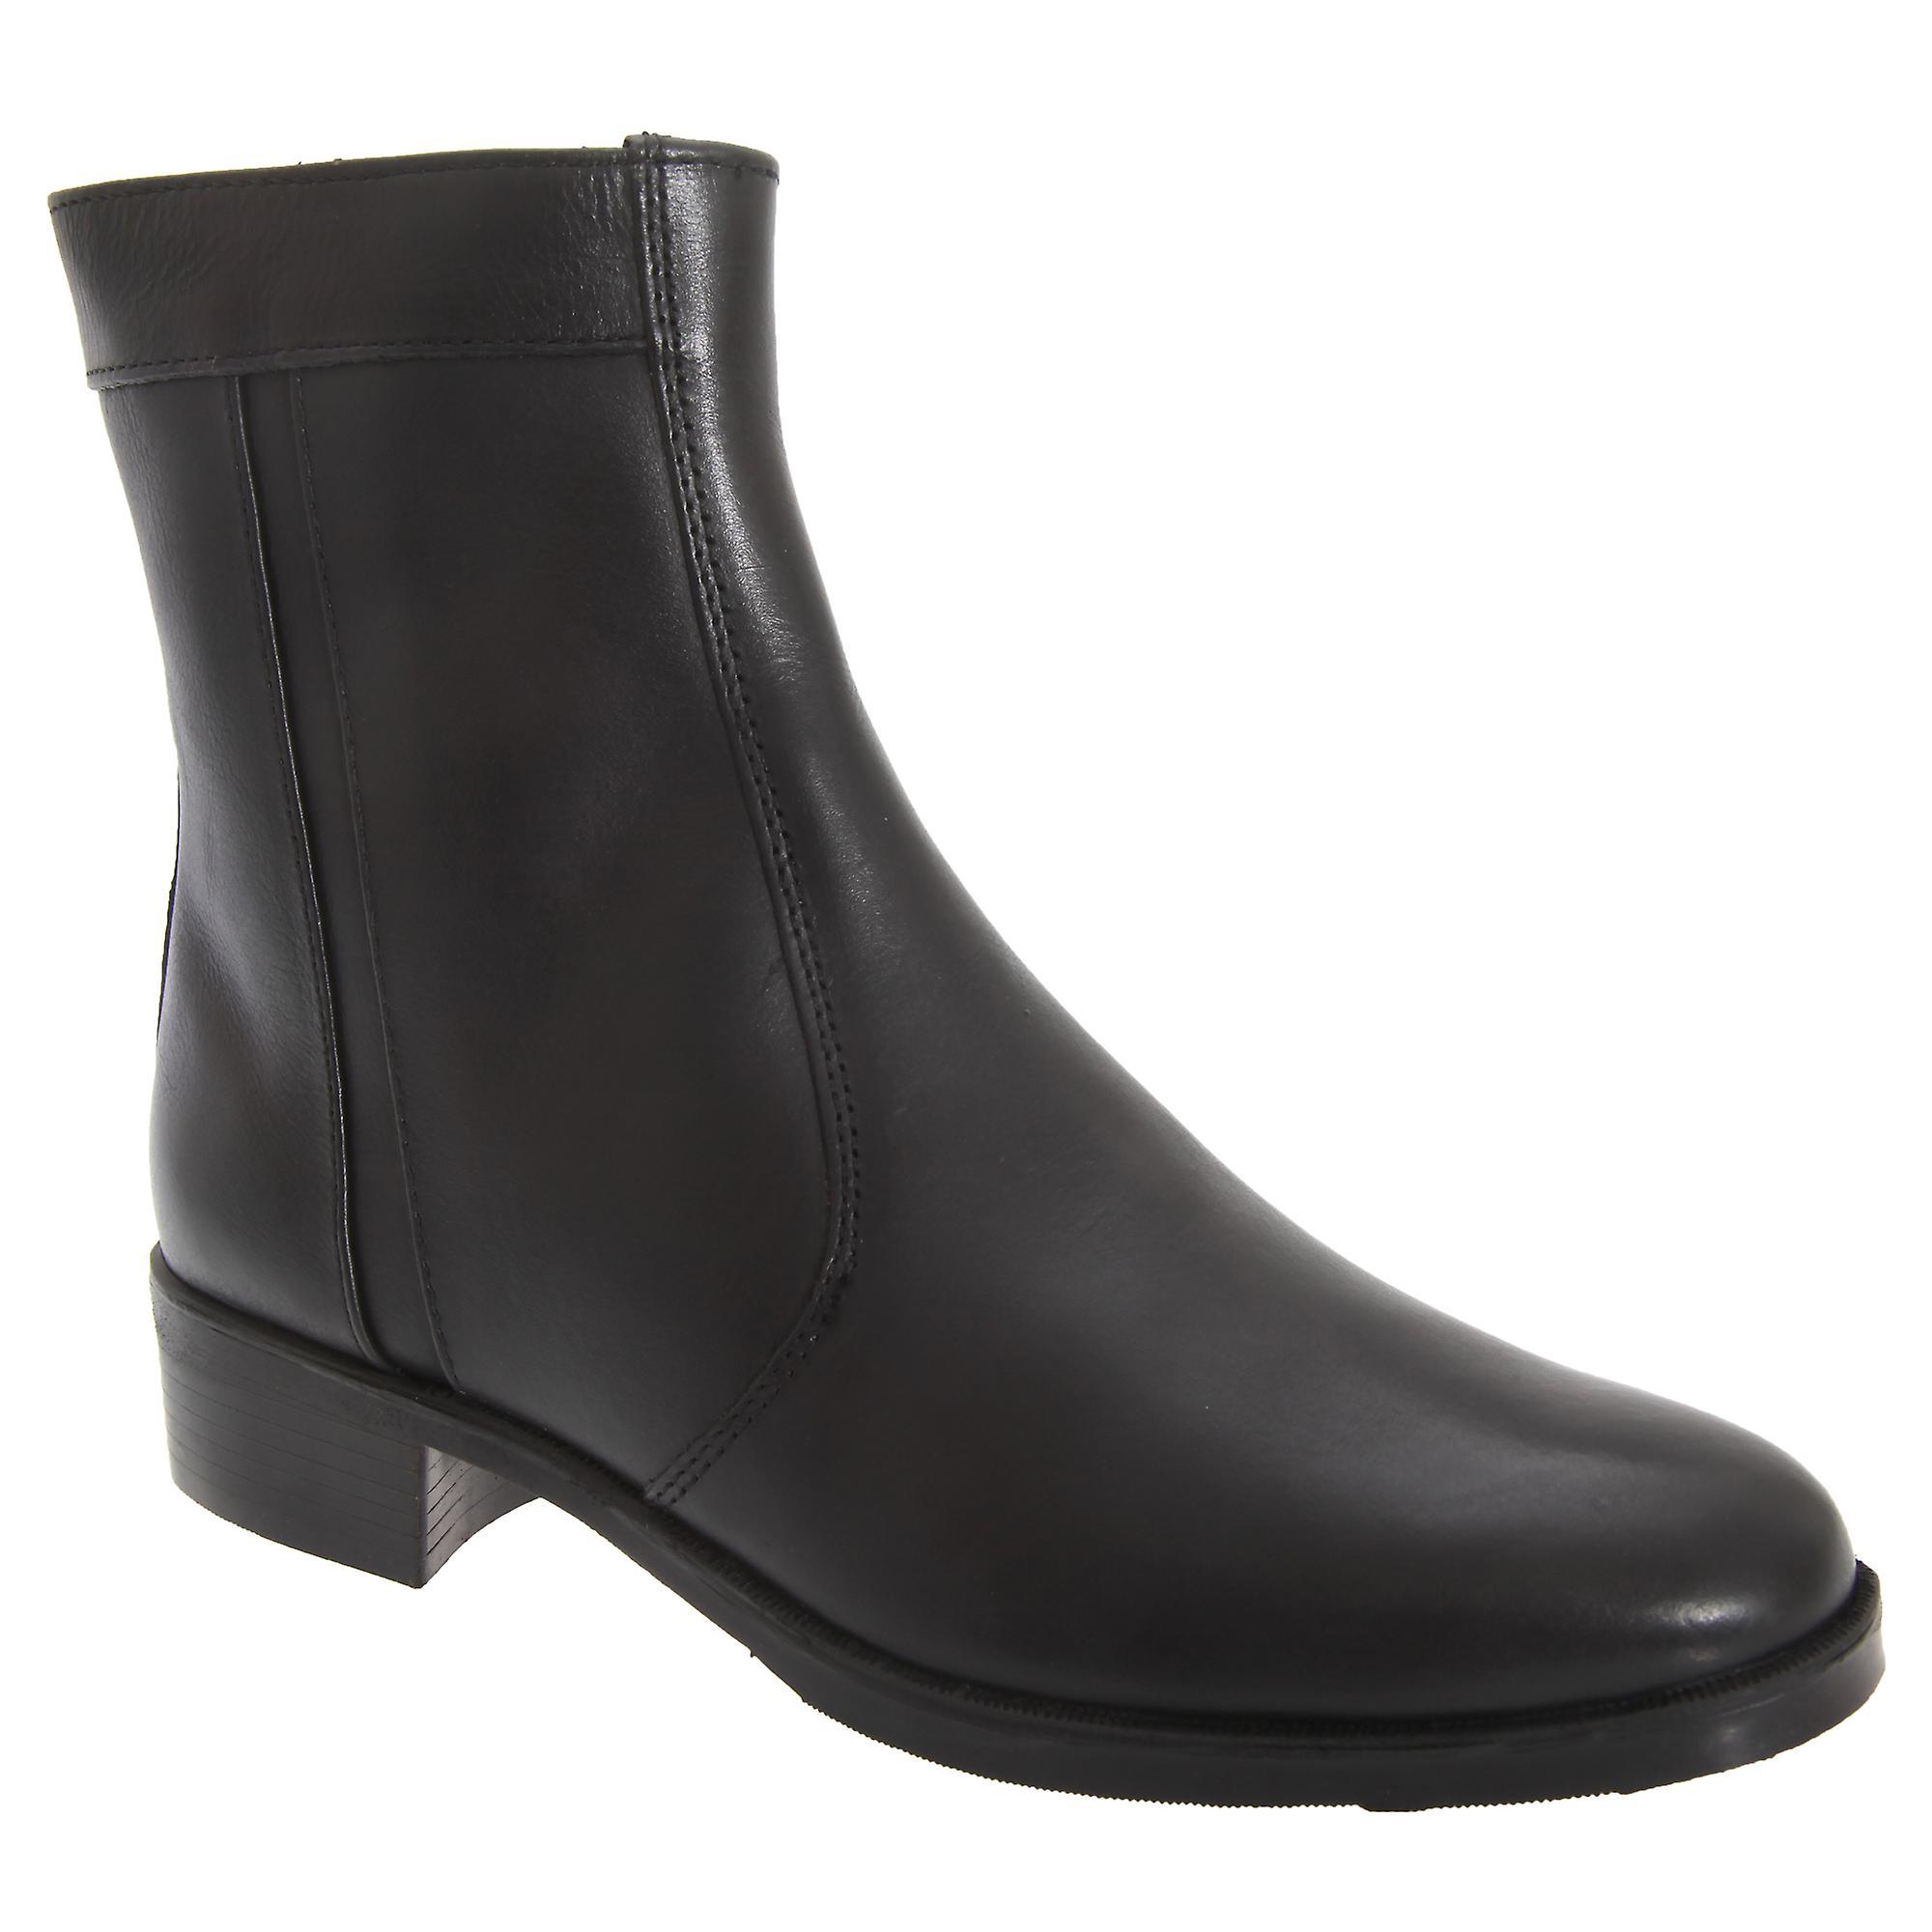 Sole Inside Mens Boots Resin Scimitar Lined Zip wXUxx4q